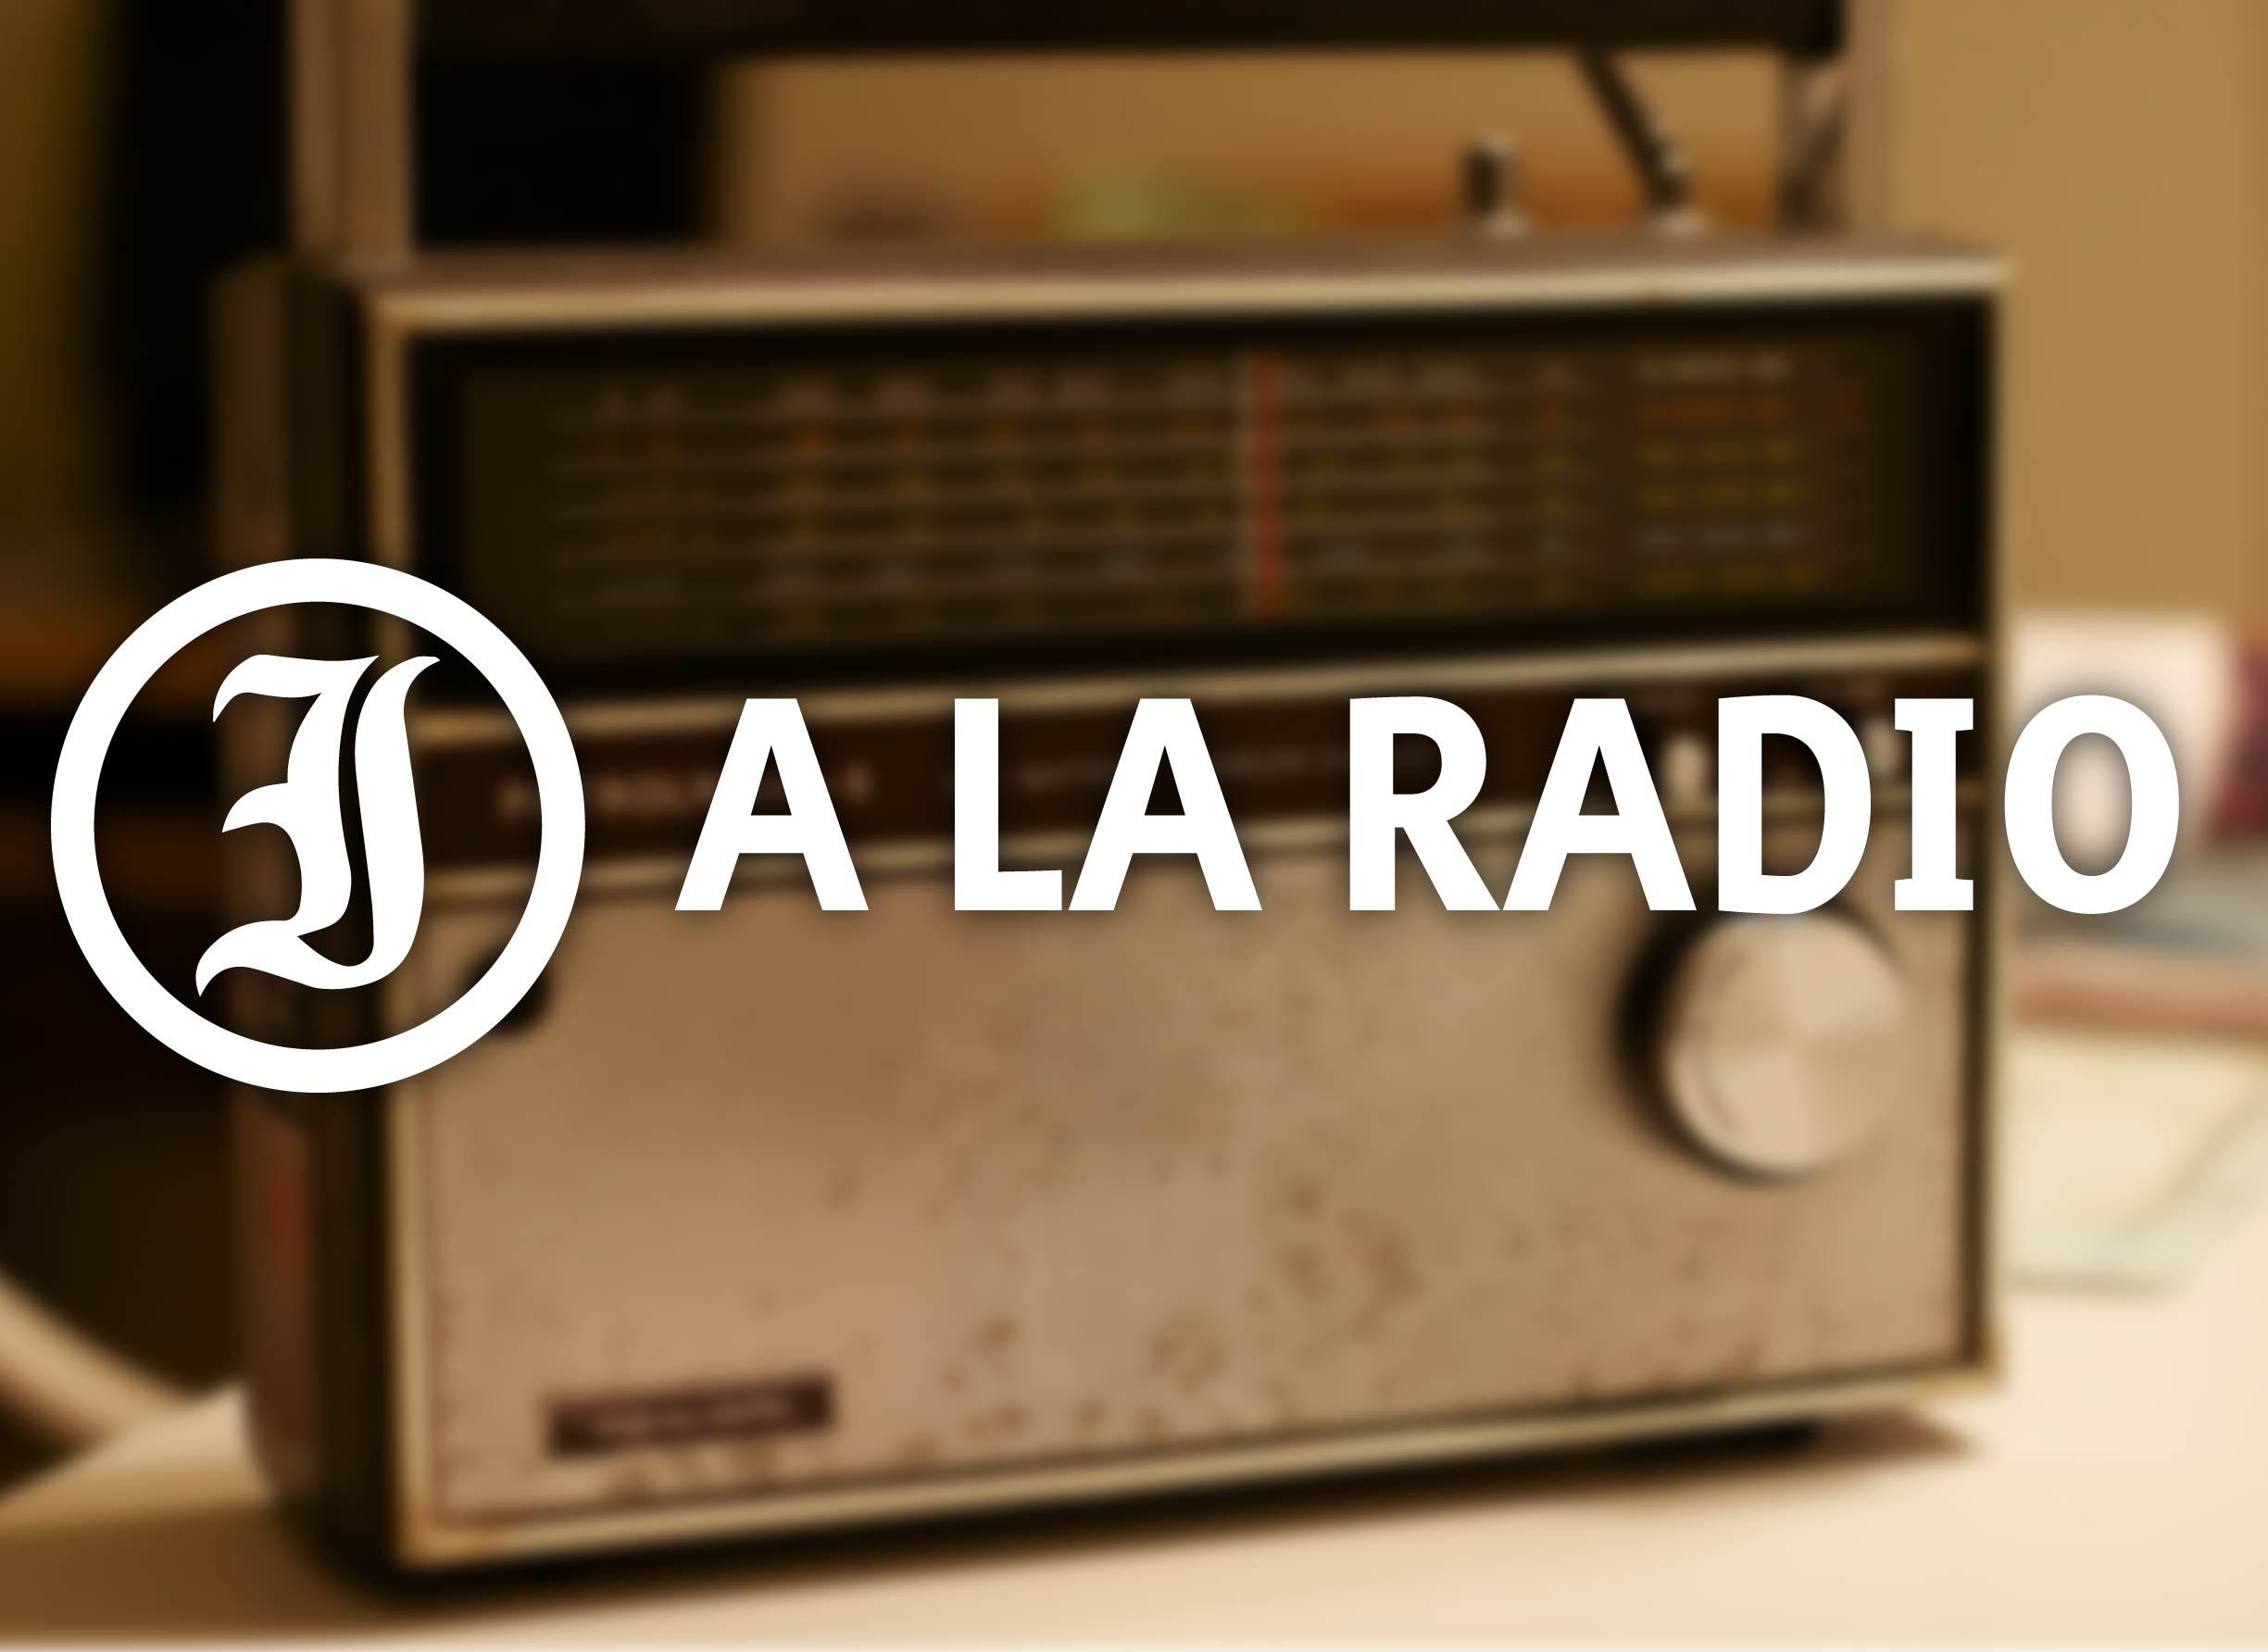 Le Journal International à la radio